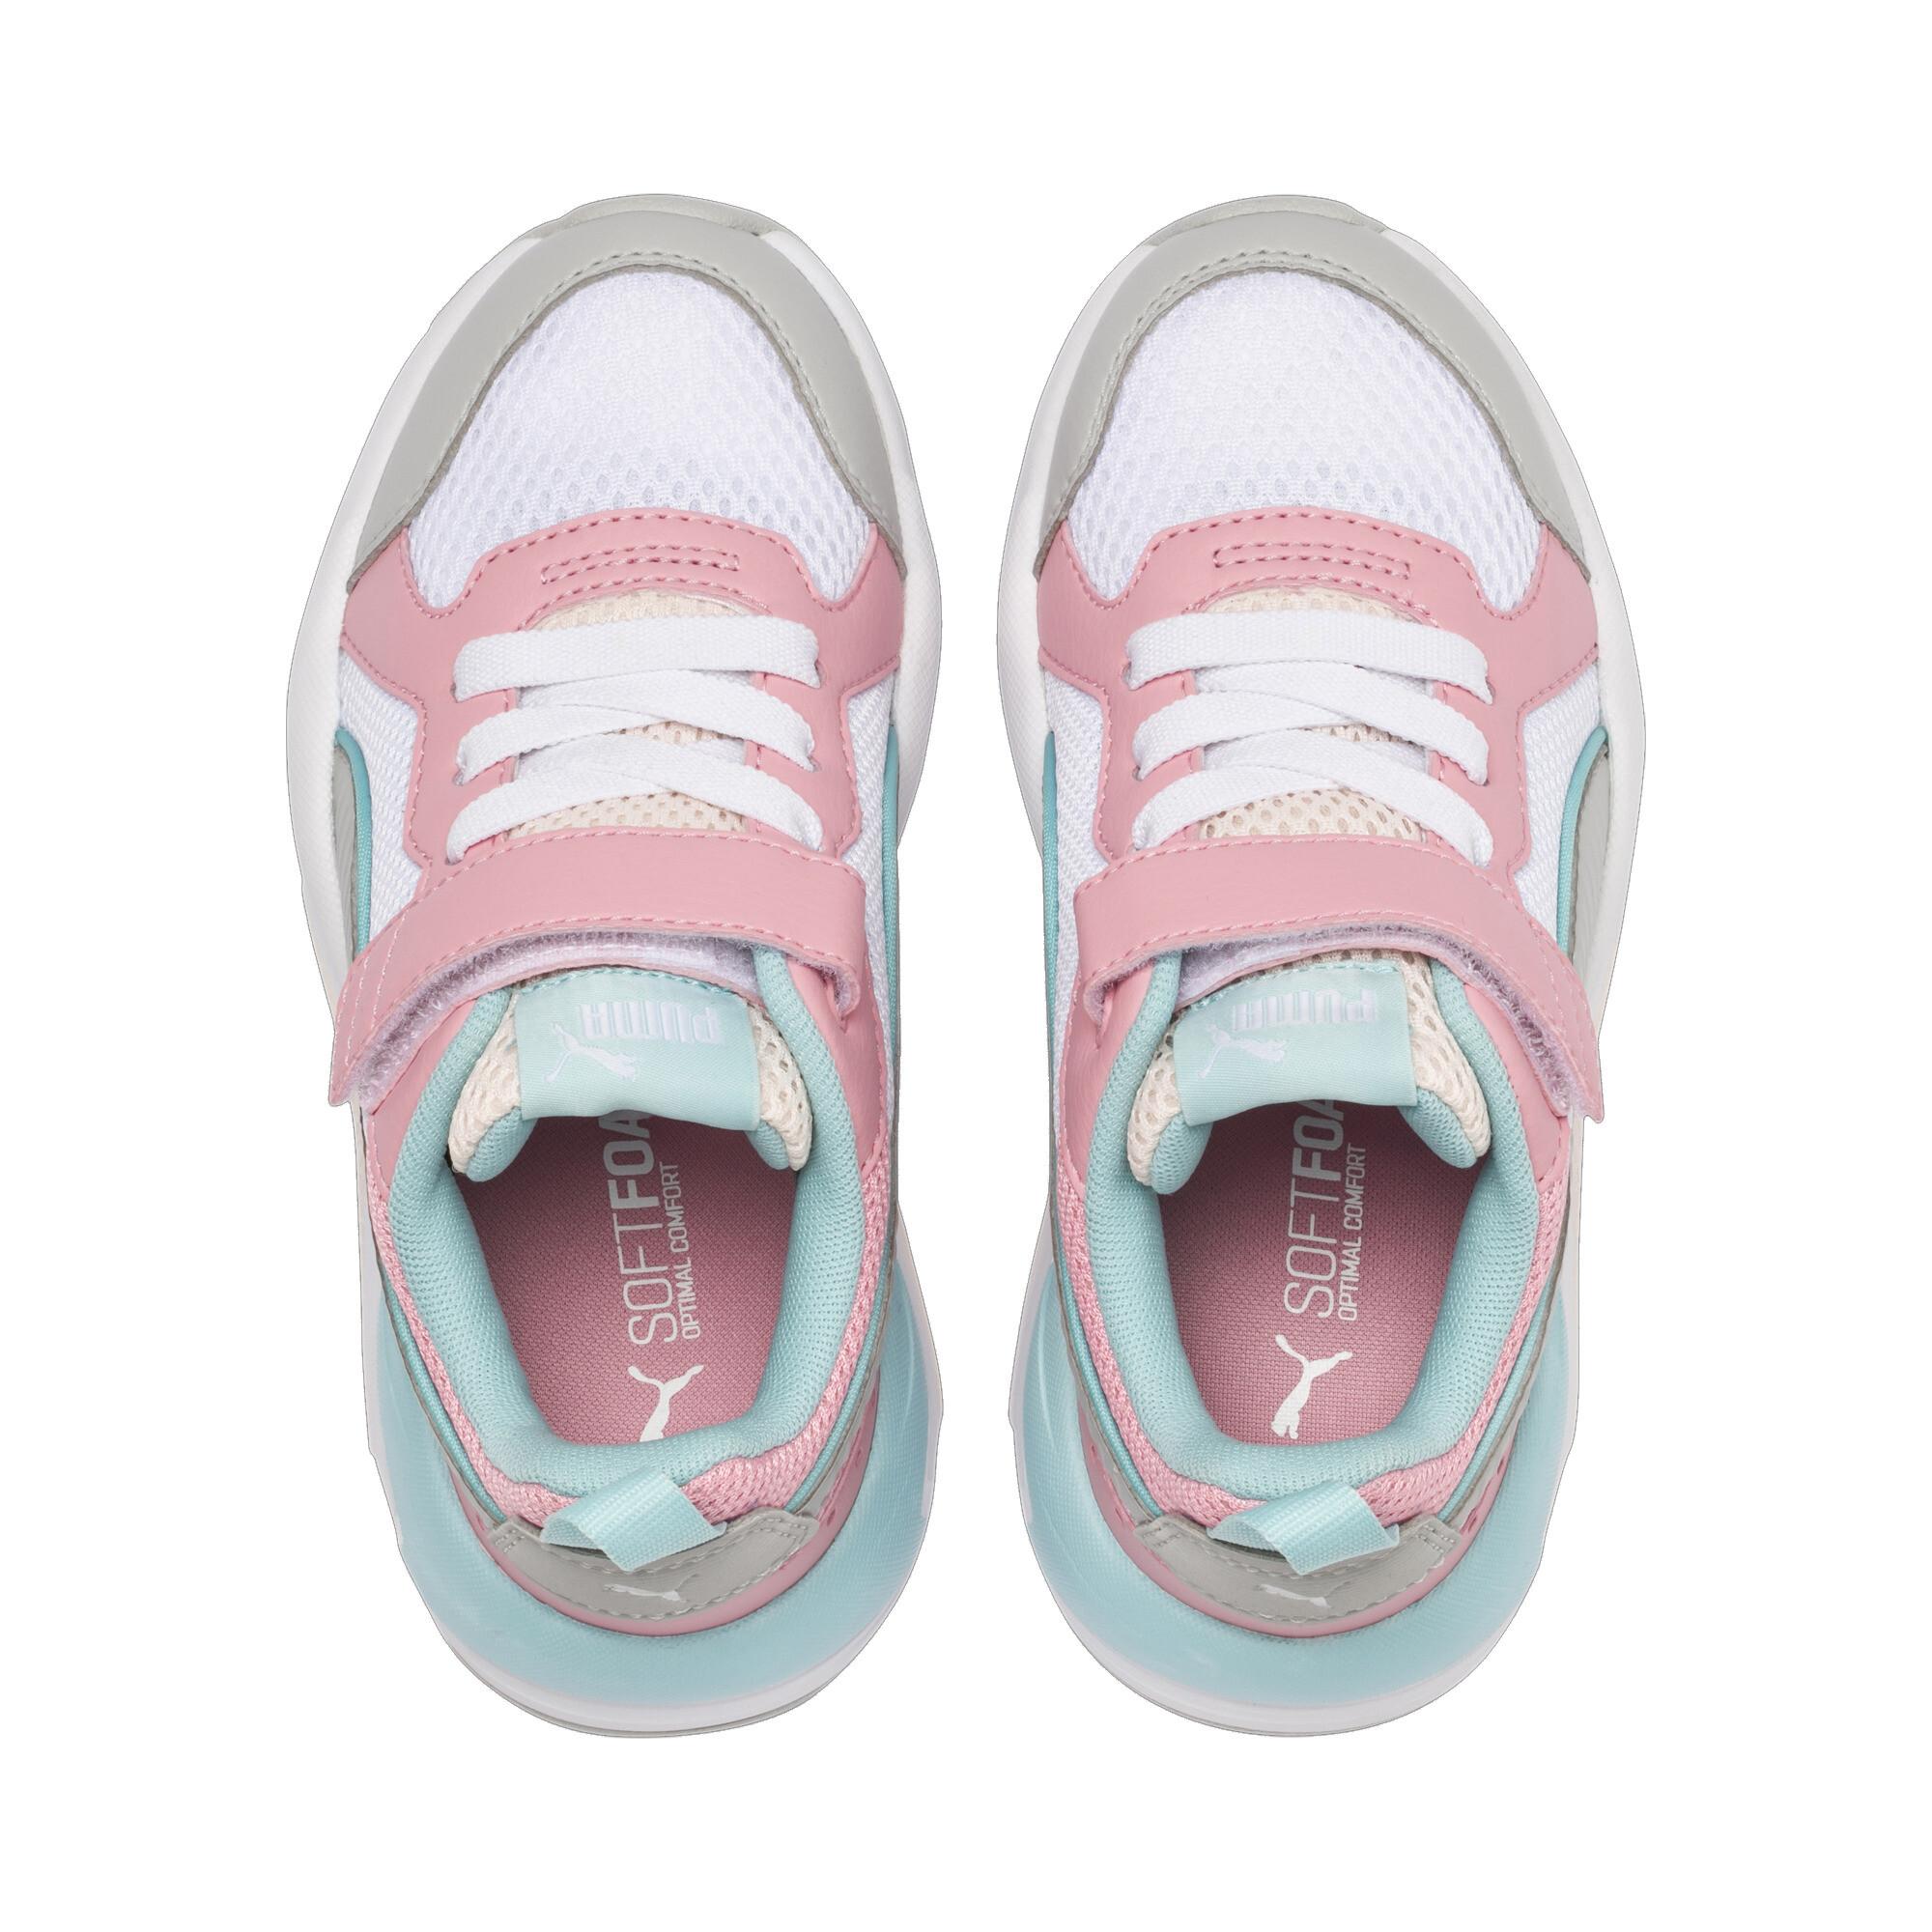 PUMA-X-RAY-Little-Kids-039-Shoes-Kids-Shoe-Kids thumbnail 7